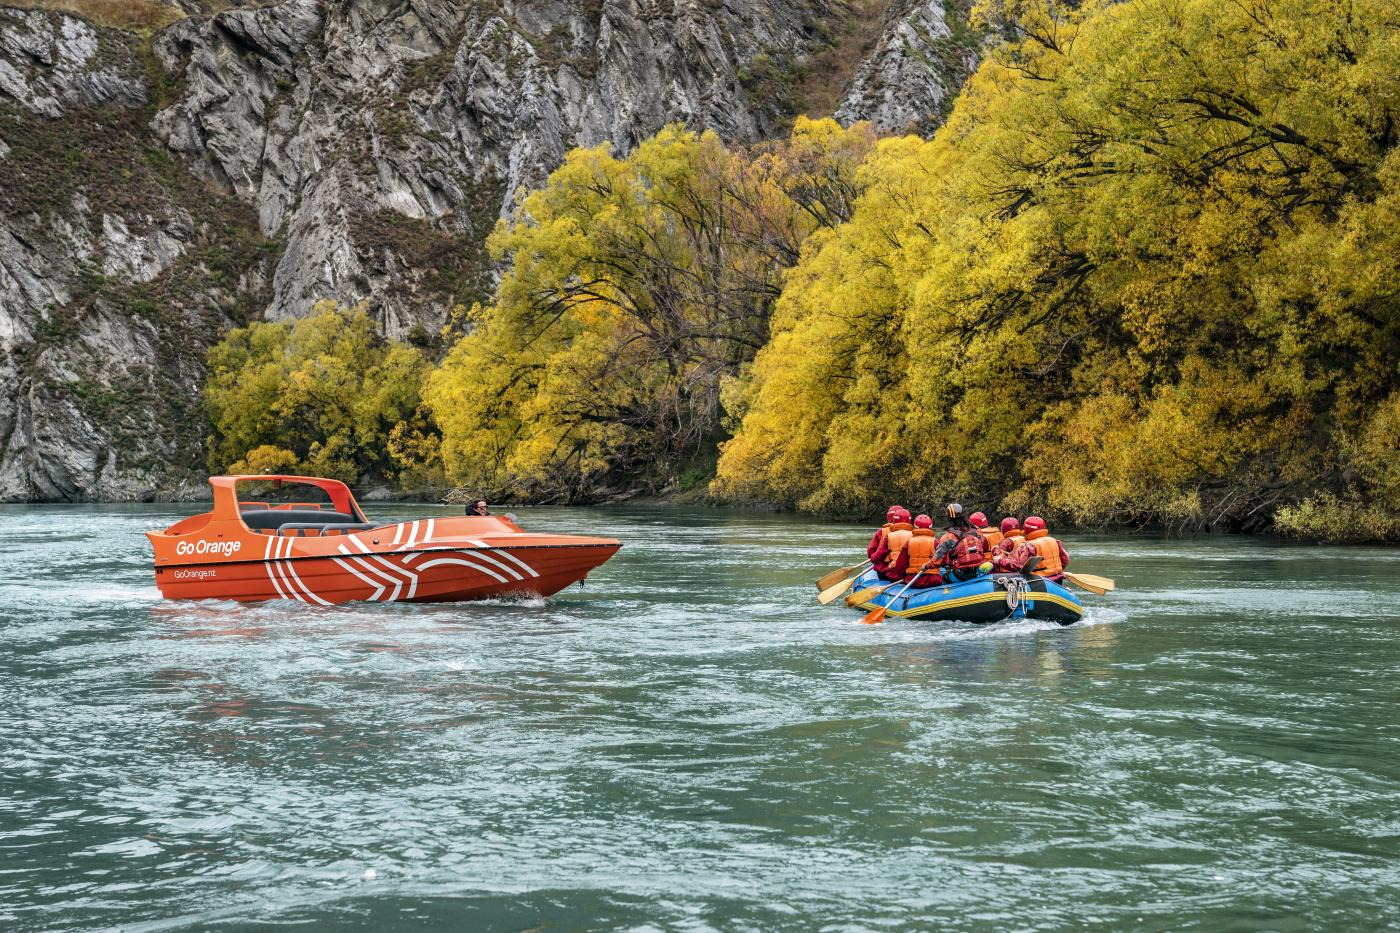 Go Orange Jetboat & Rafting